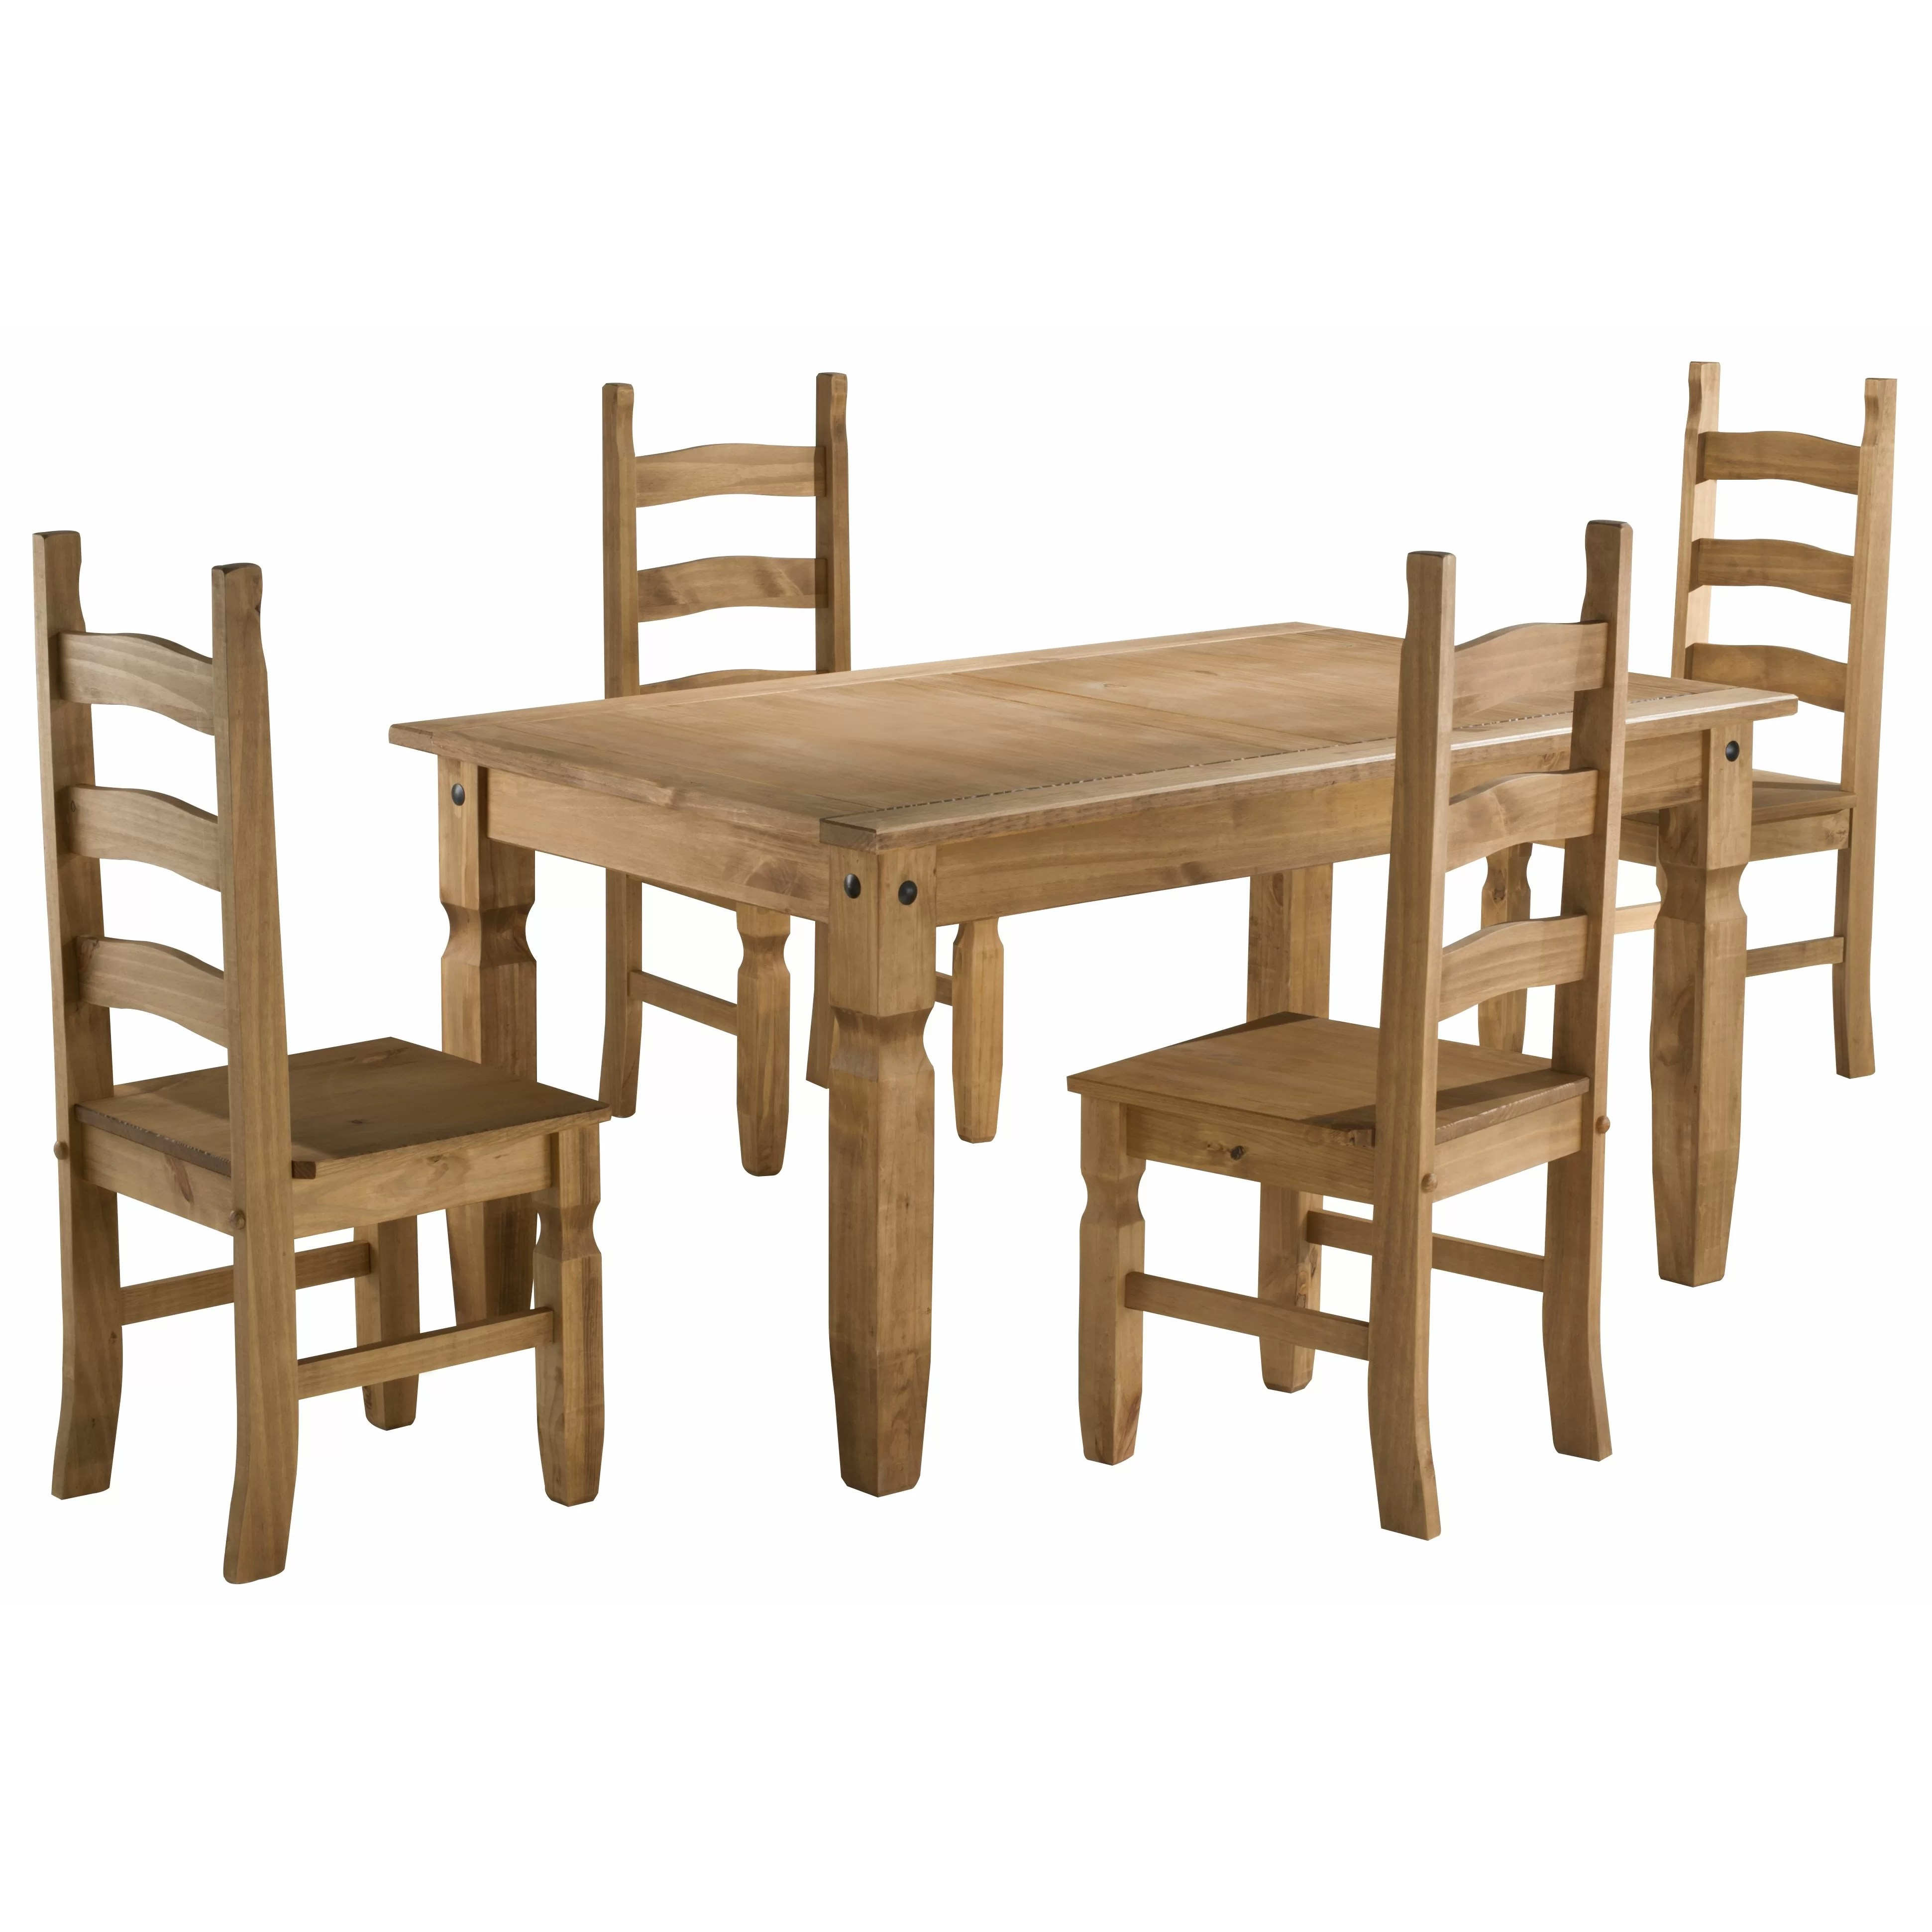 cheap pine dining chairs white leather for sale birlea corona table and 4 wayfair uk